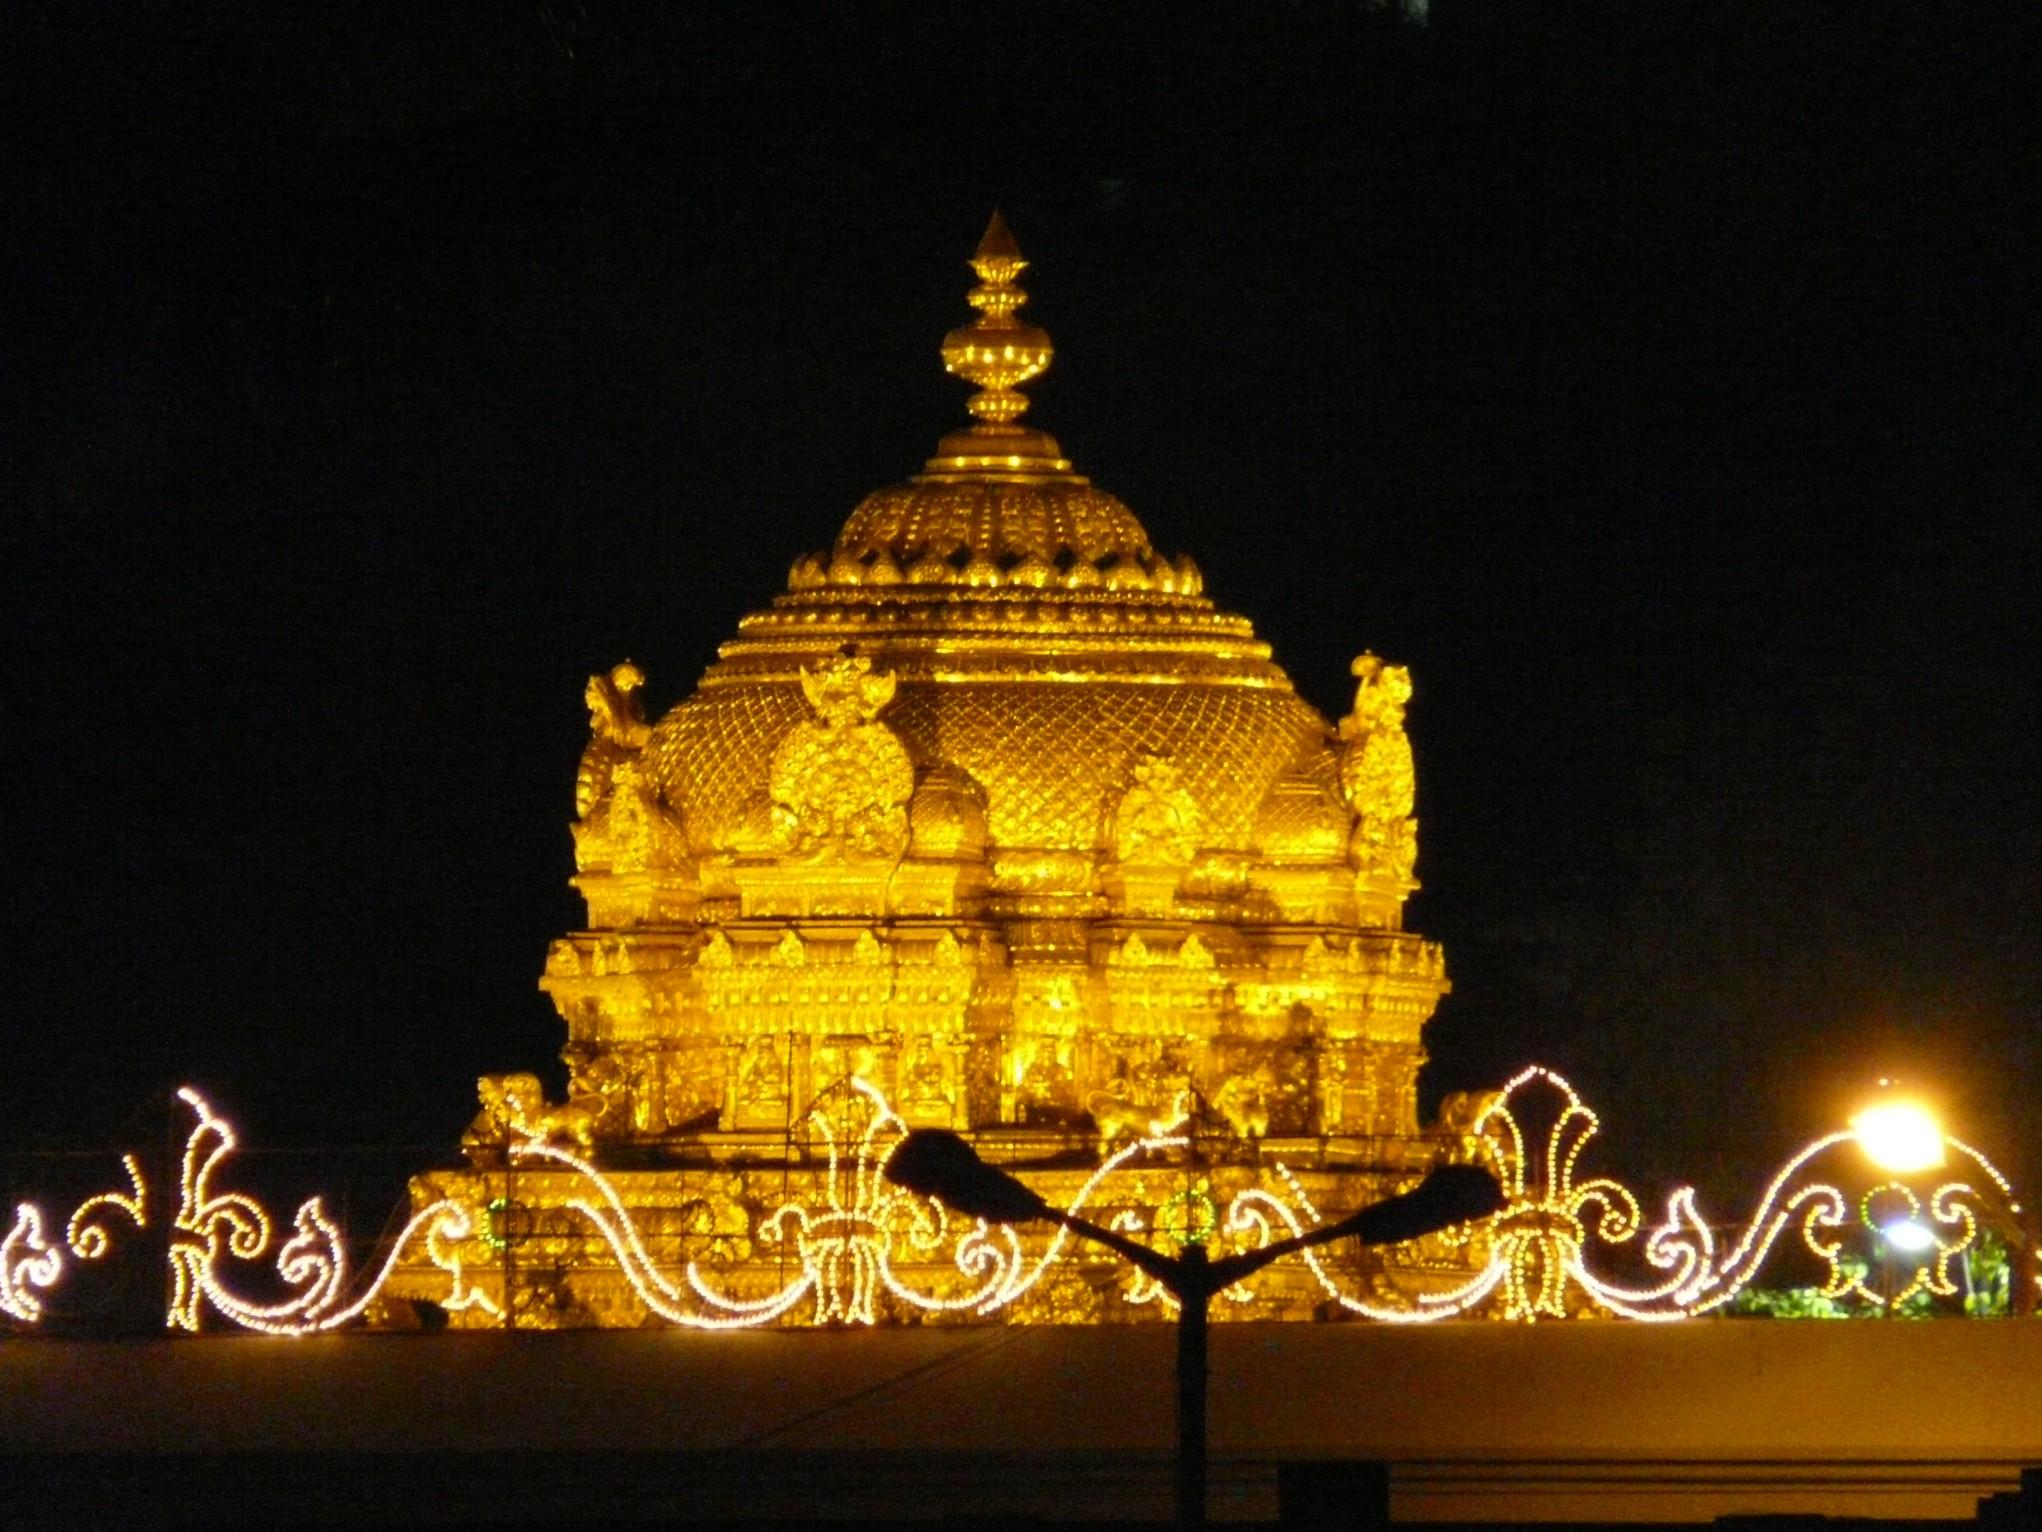 Venkateswara Swamy Hd Wallpapers Amazing Golden Gopuram Of The Tirumala Temple Tirumalesa